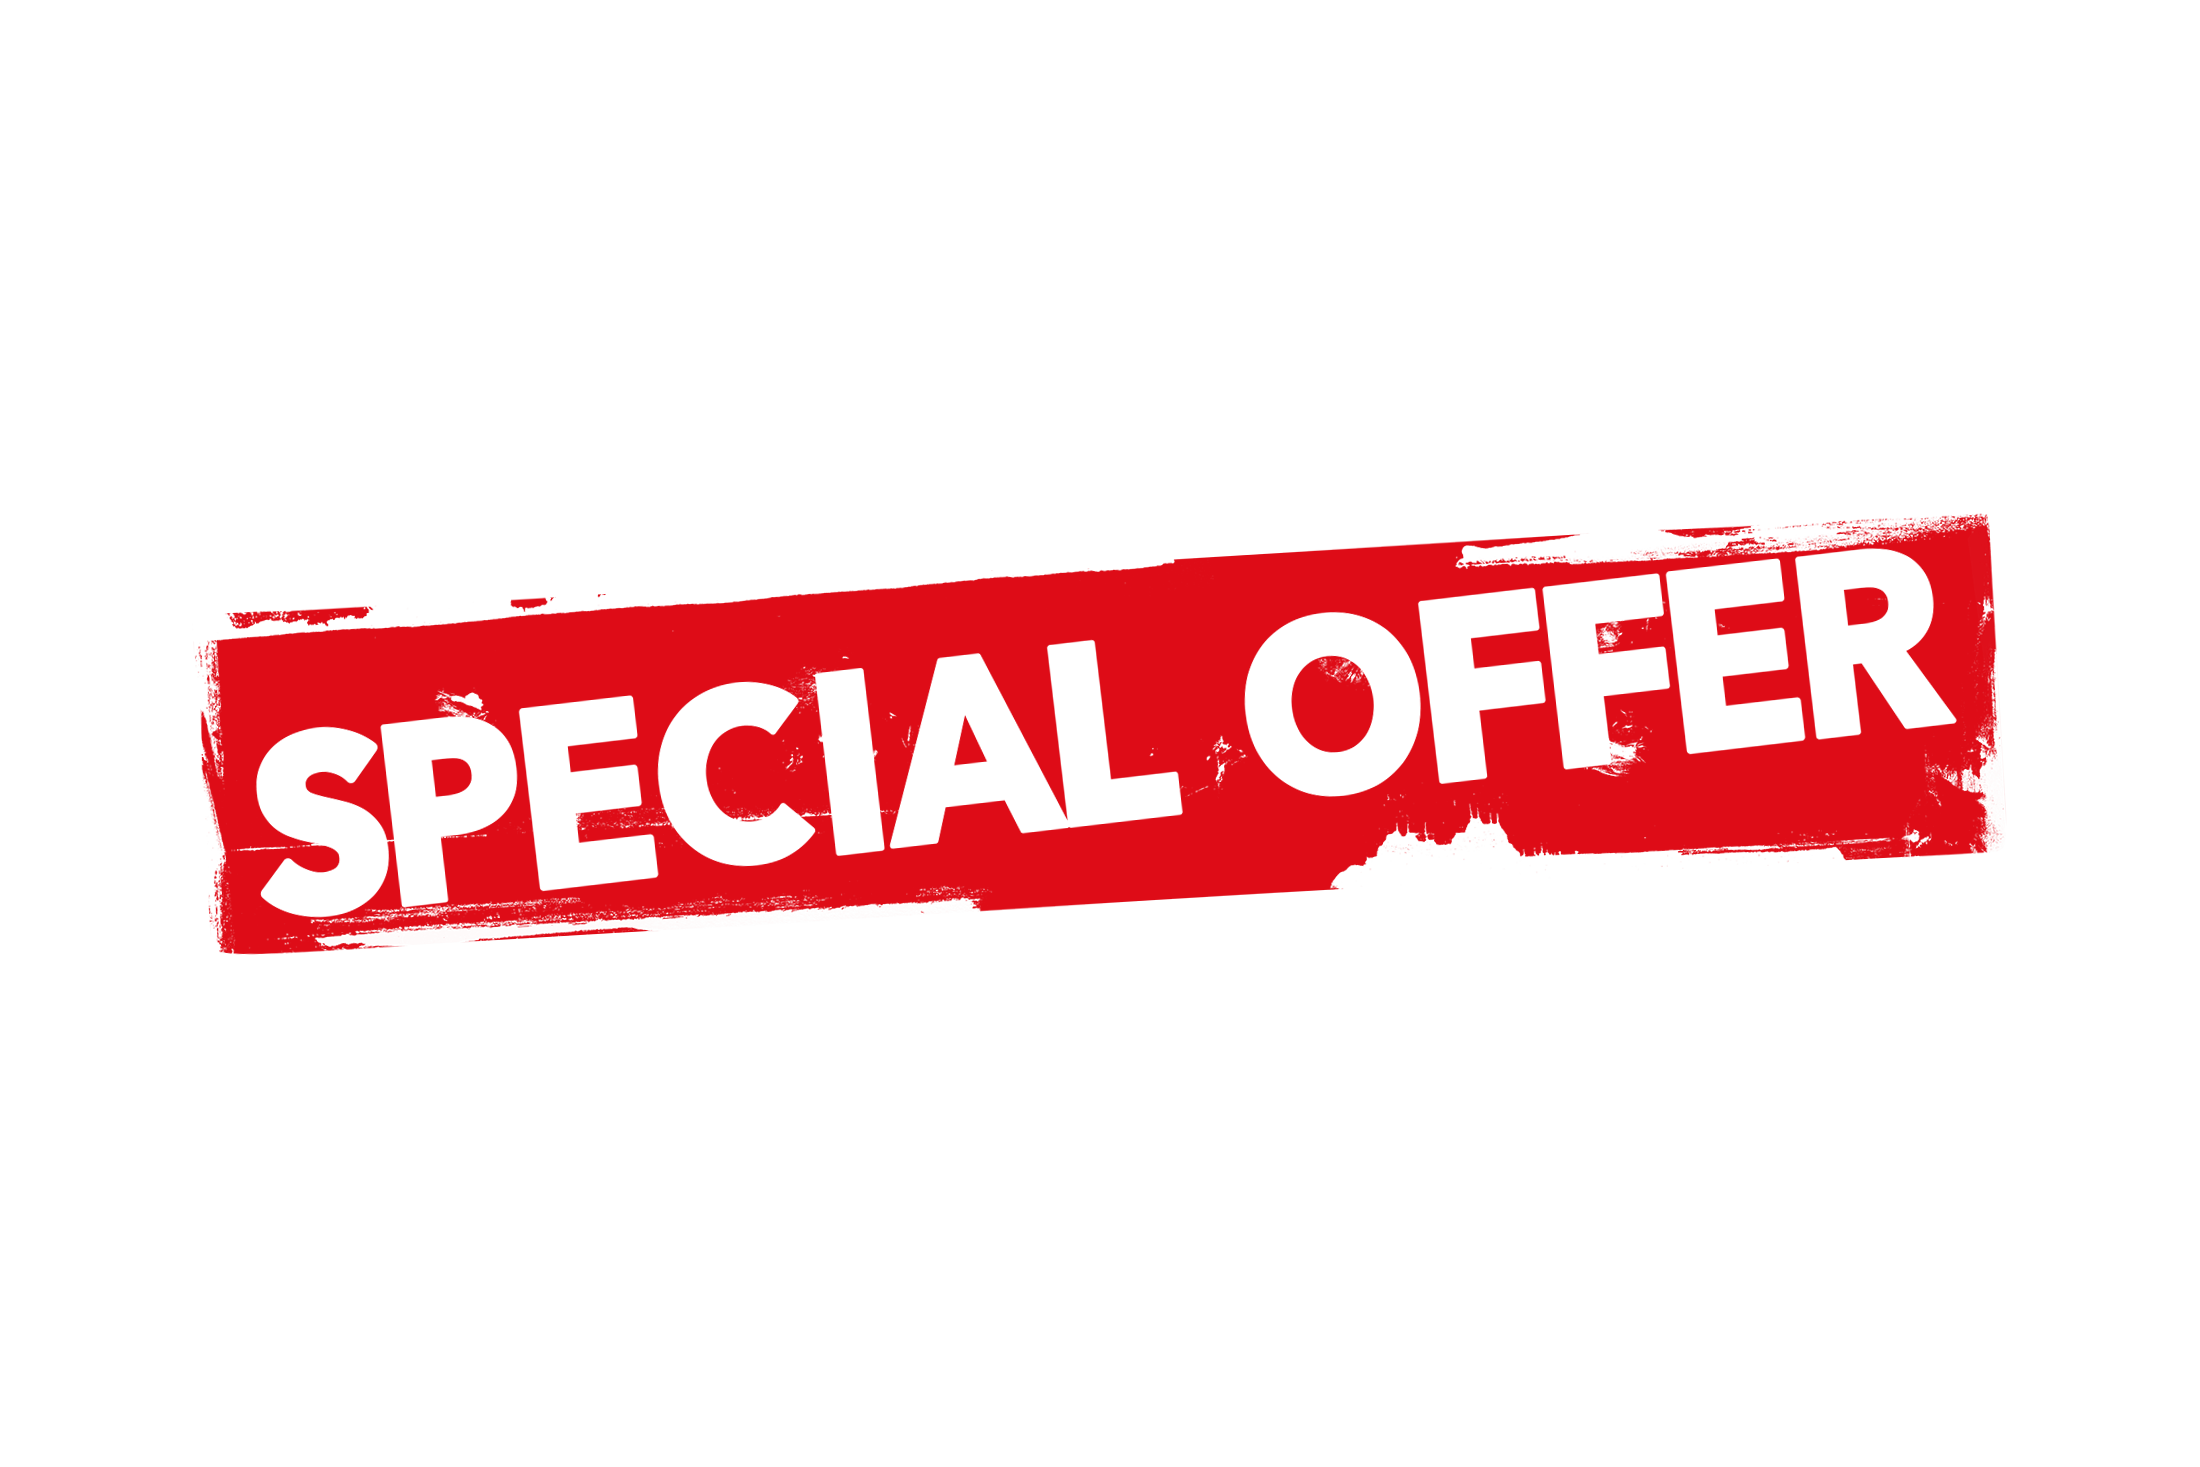 Grunge special offer label PSD